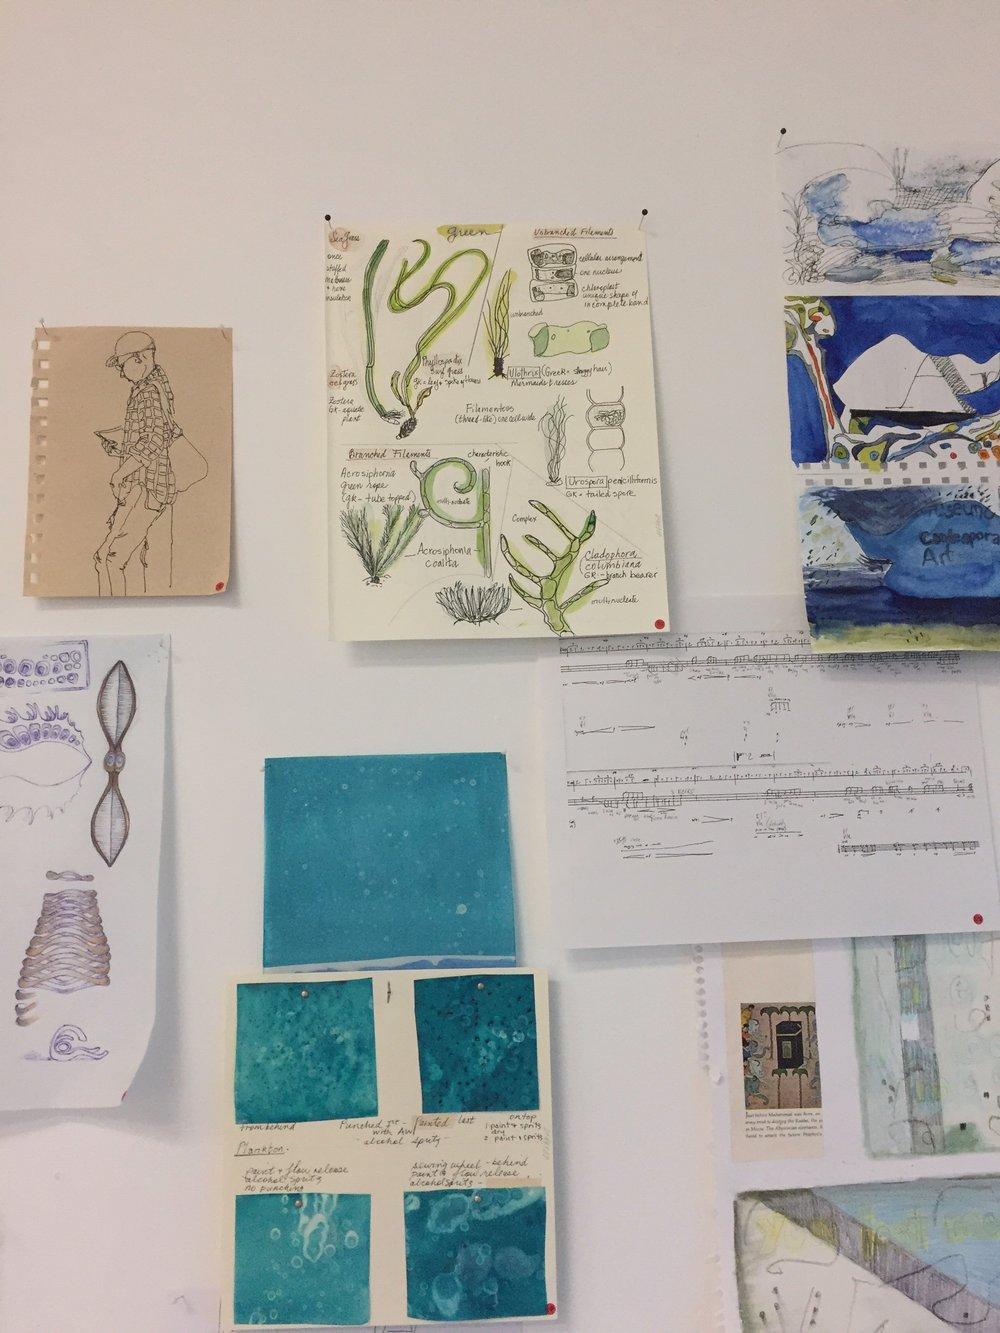 Jill Ehlert - plankton studies